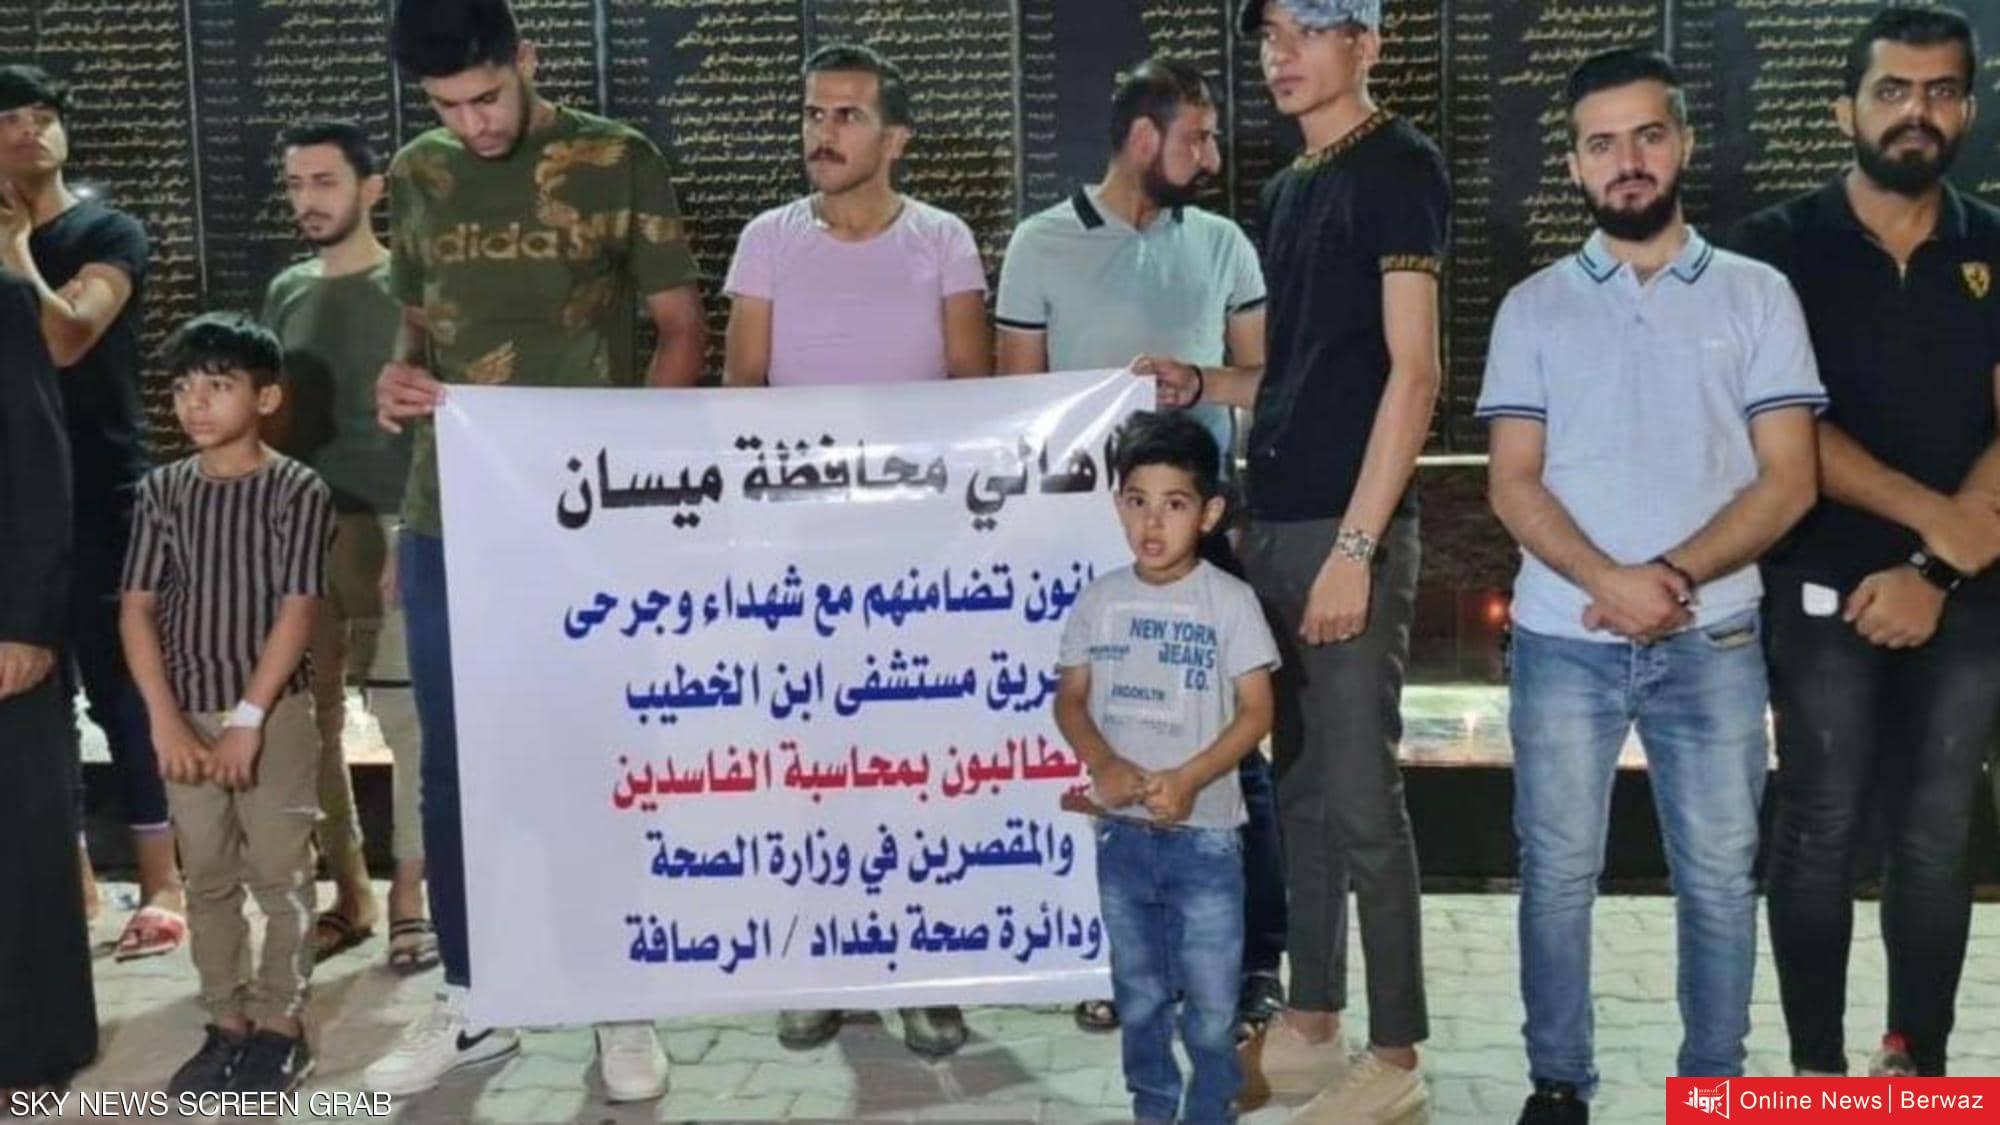 image 3 2 - تفاصيل مُفجعة يرويها أهالي ضحايا المستشفى المحترقة بالعراق